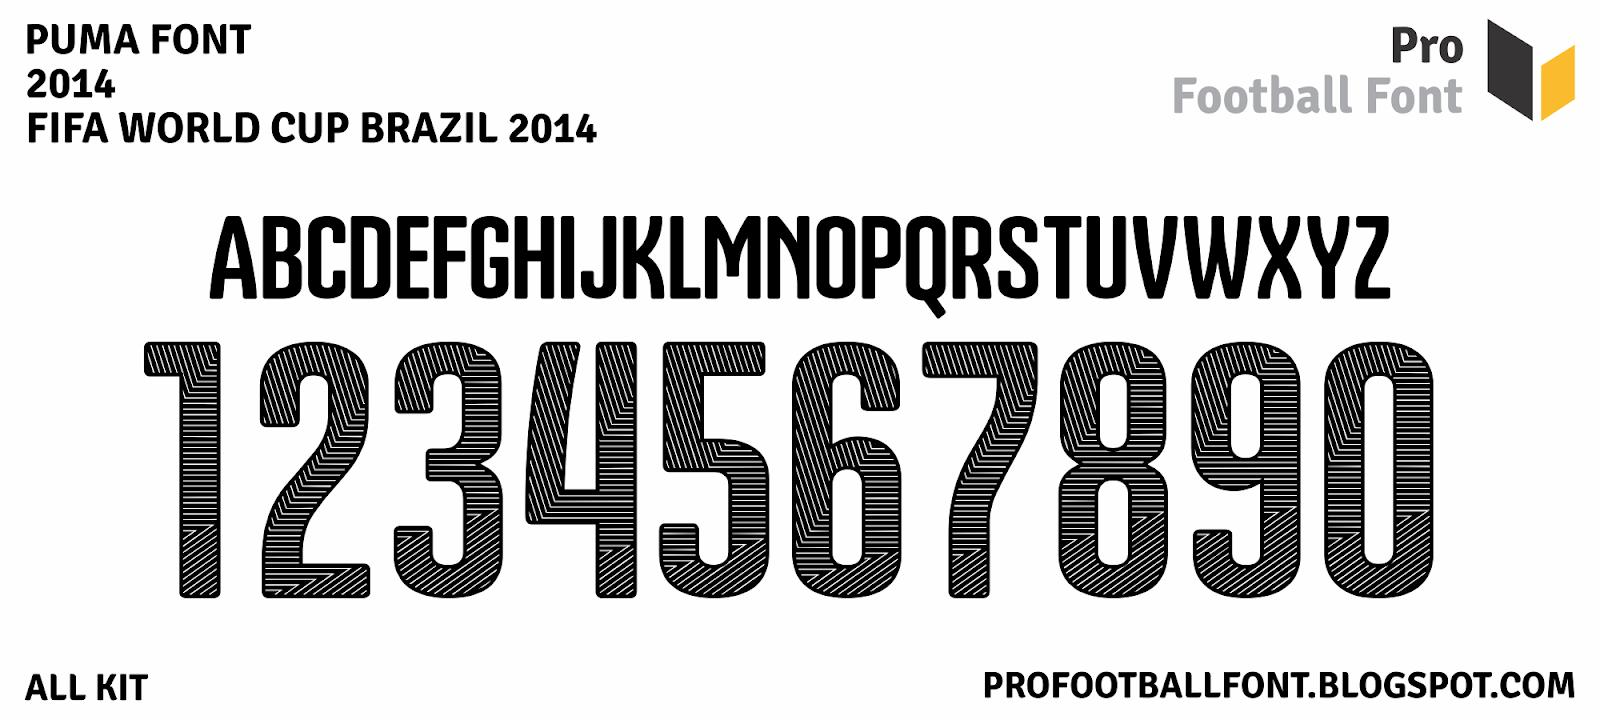 puma world cup 2014 font puma world cup 2014 font